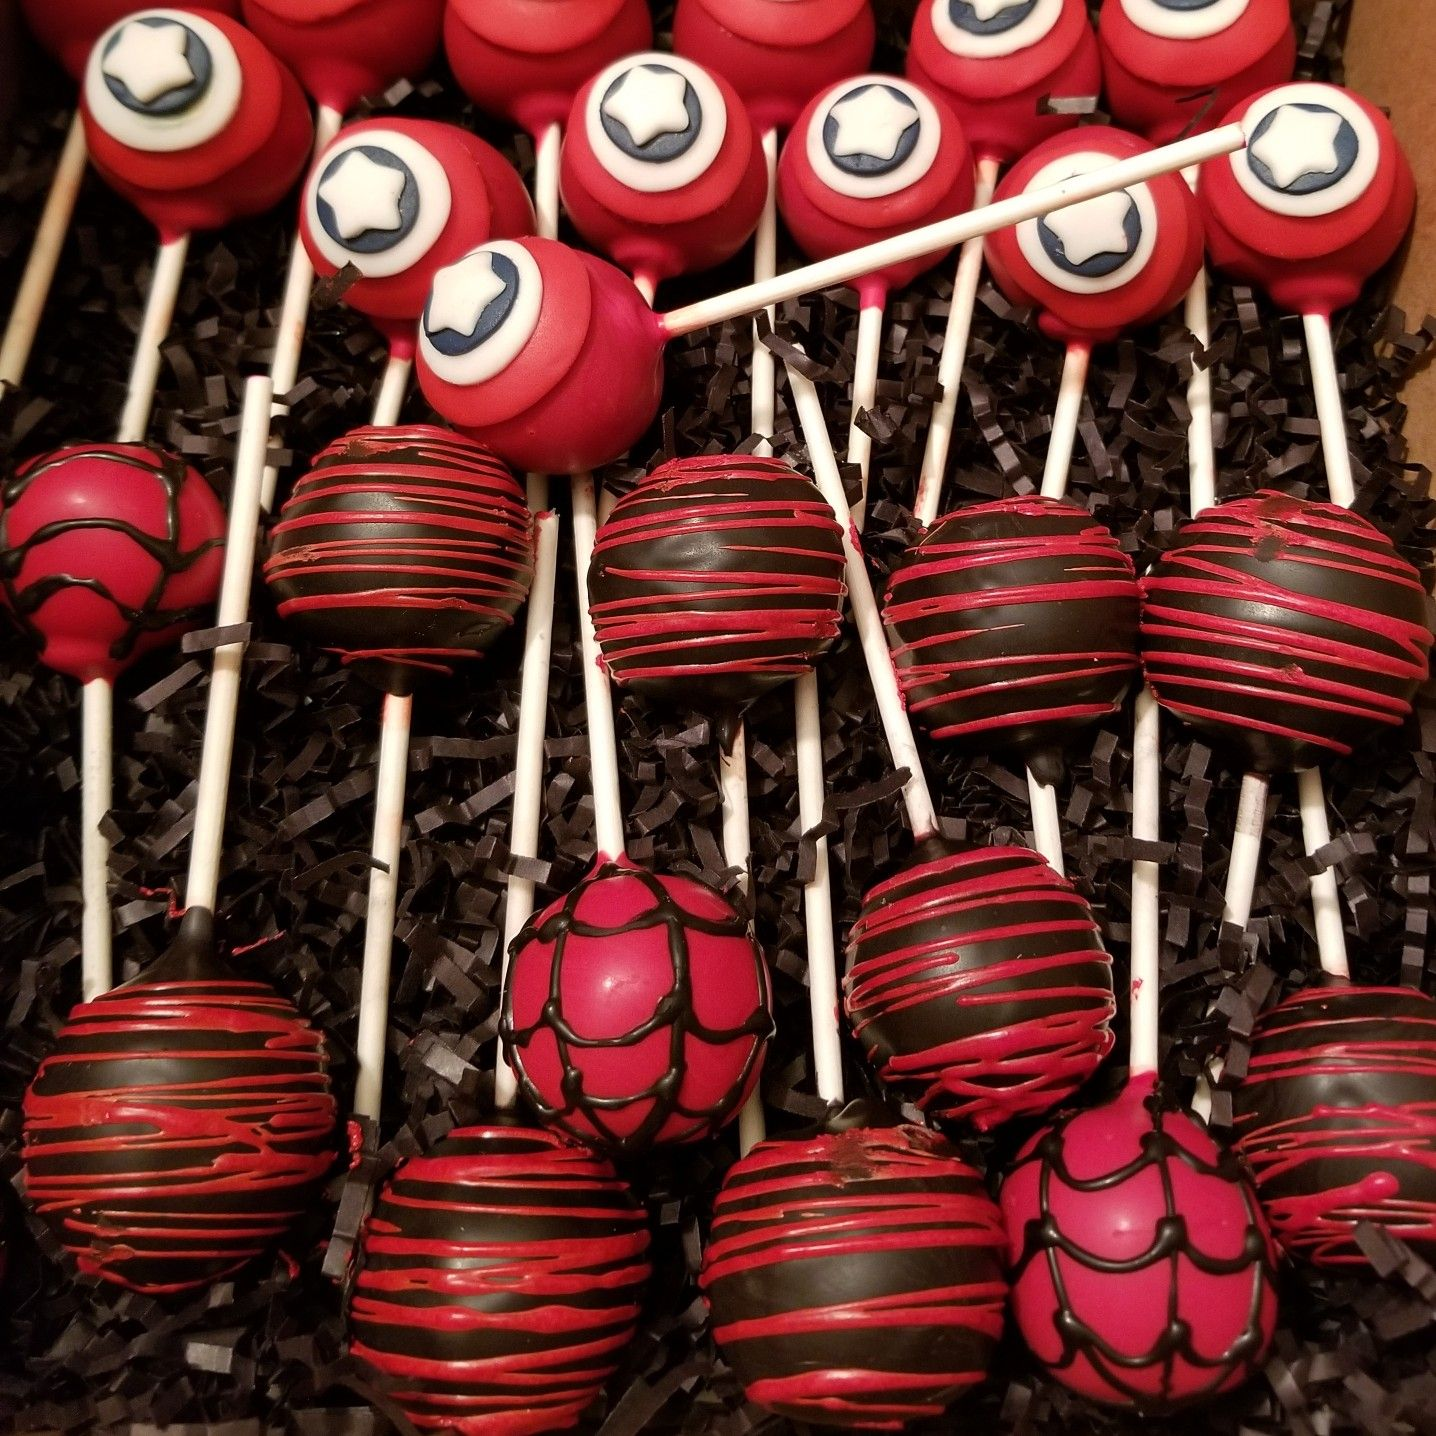 Captain america and spiderman cake pops spiderman cake